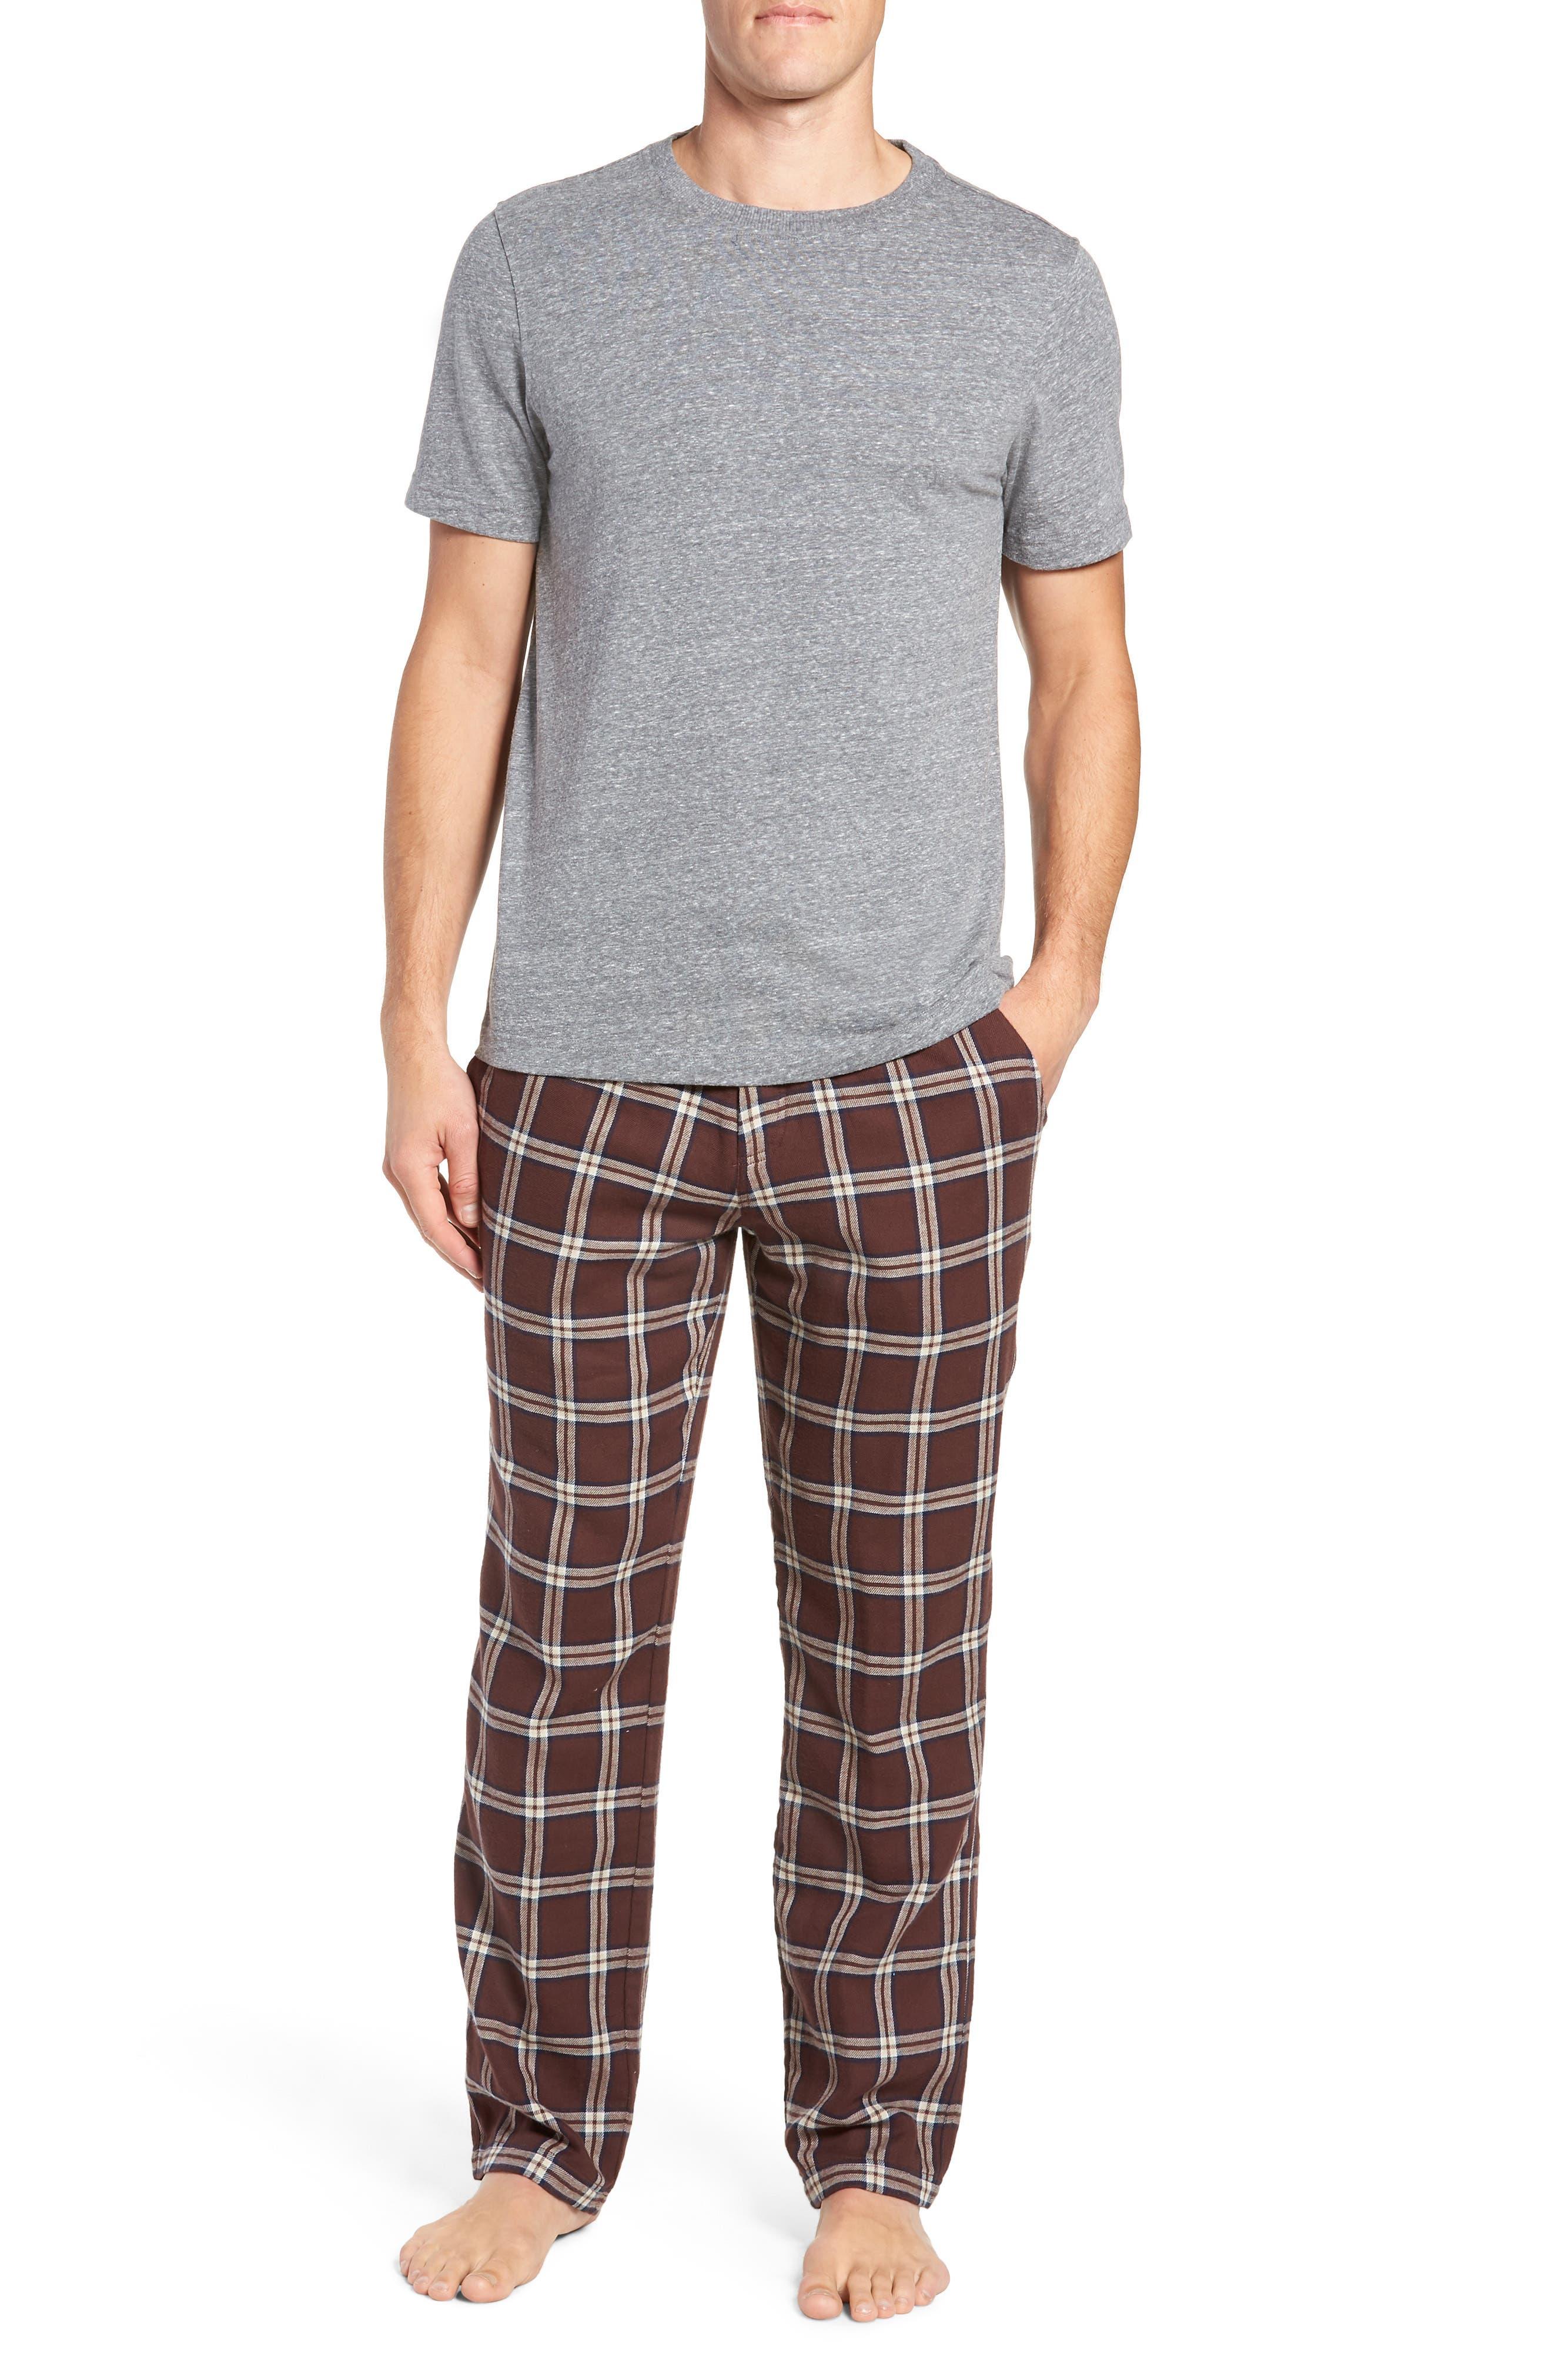 Grant Pajama Set,                             Main thumbnail 1, color,                             PORT/ GREY HEATHER